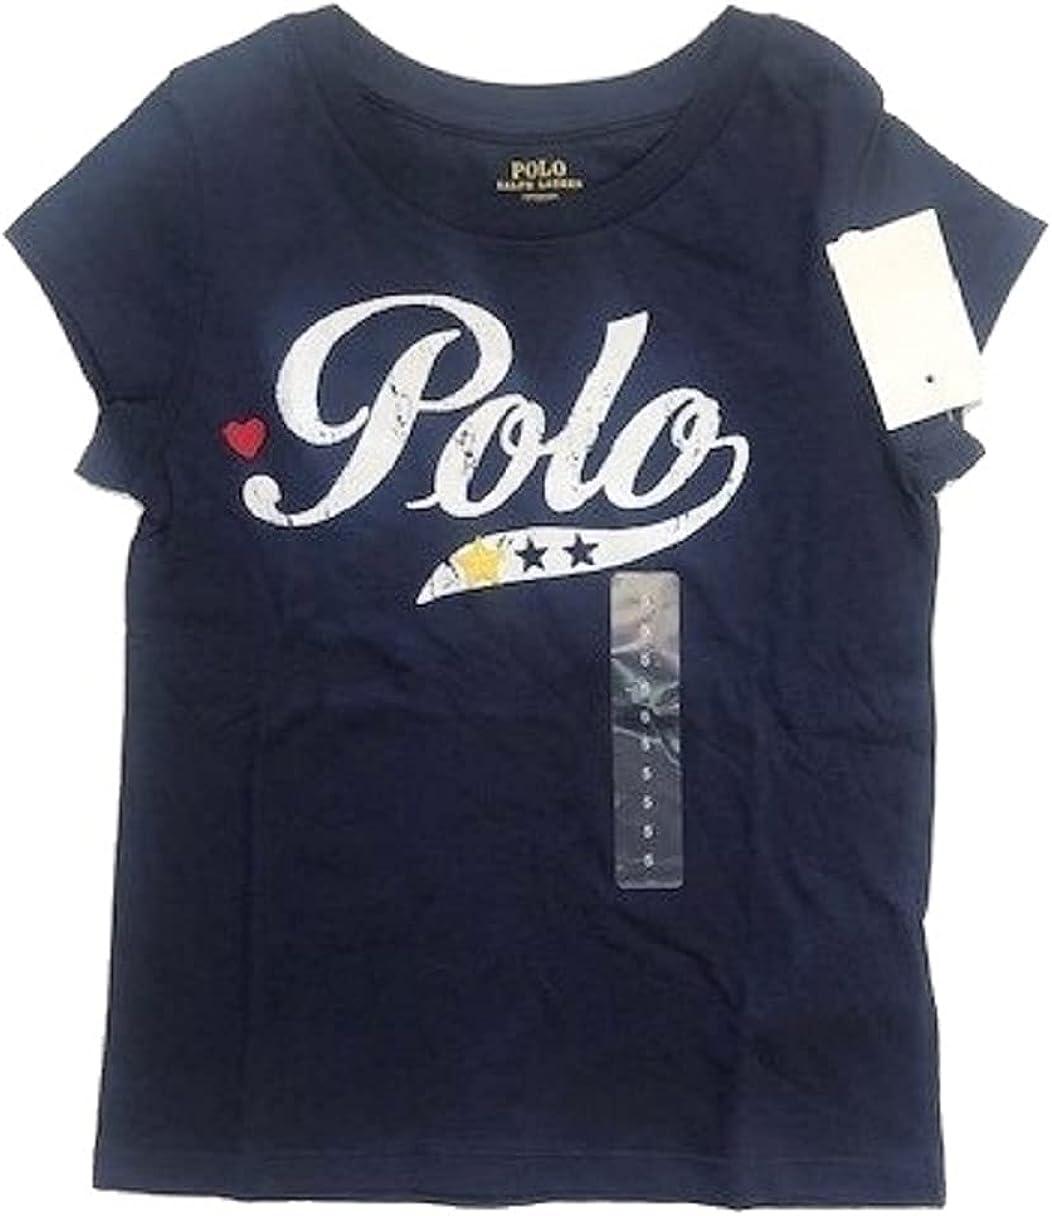 Polo Ralph Lauren Navy Boys Short Sleeve Tee, US 5